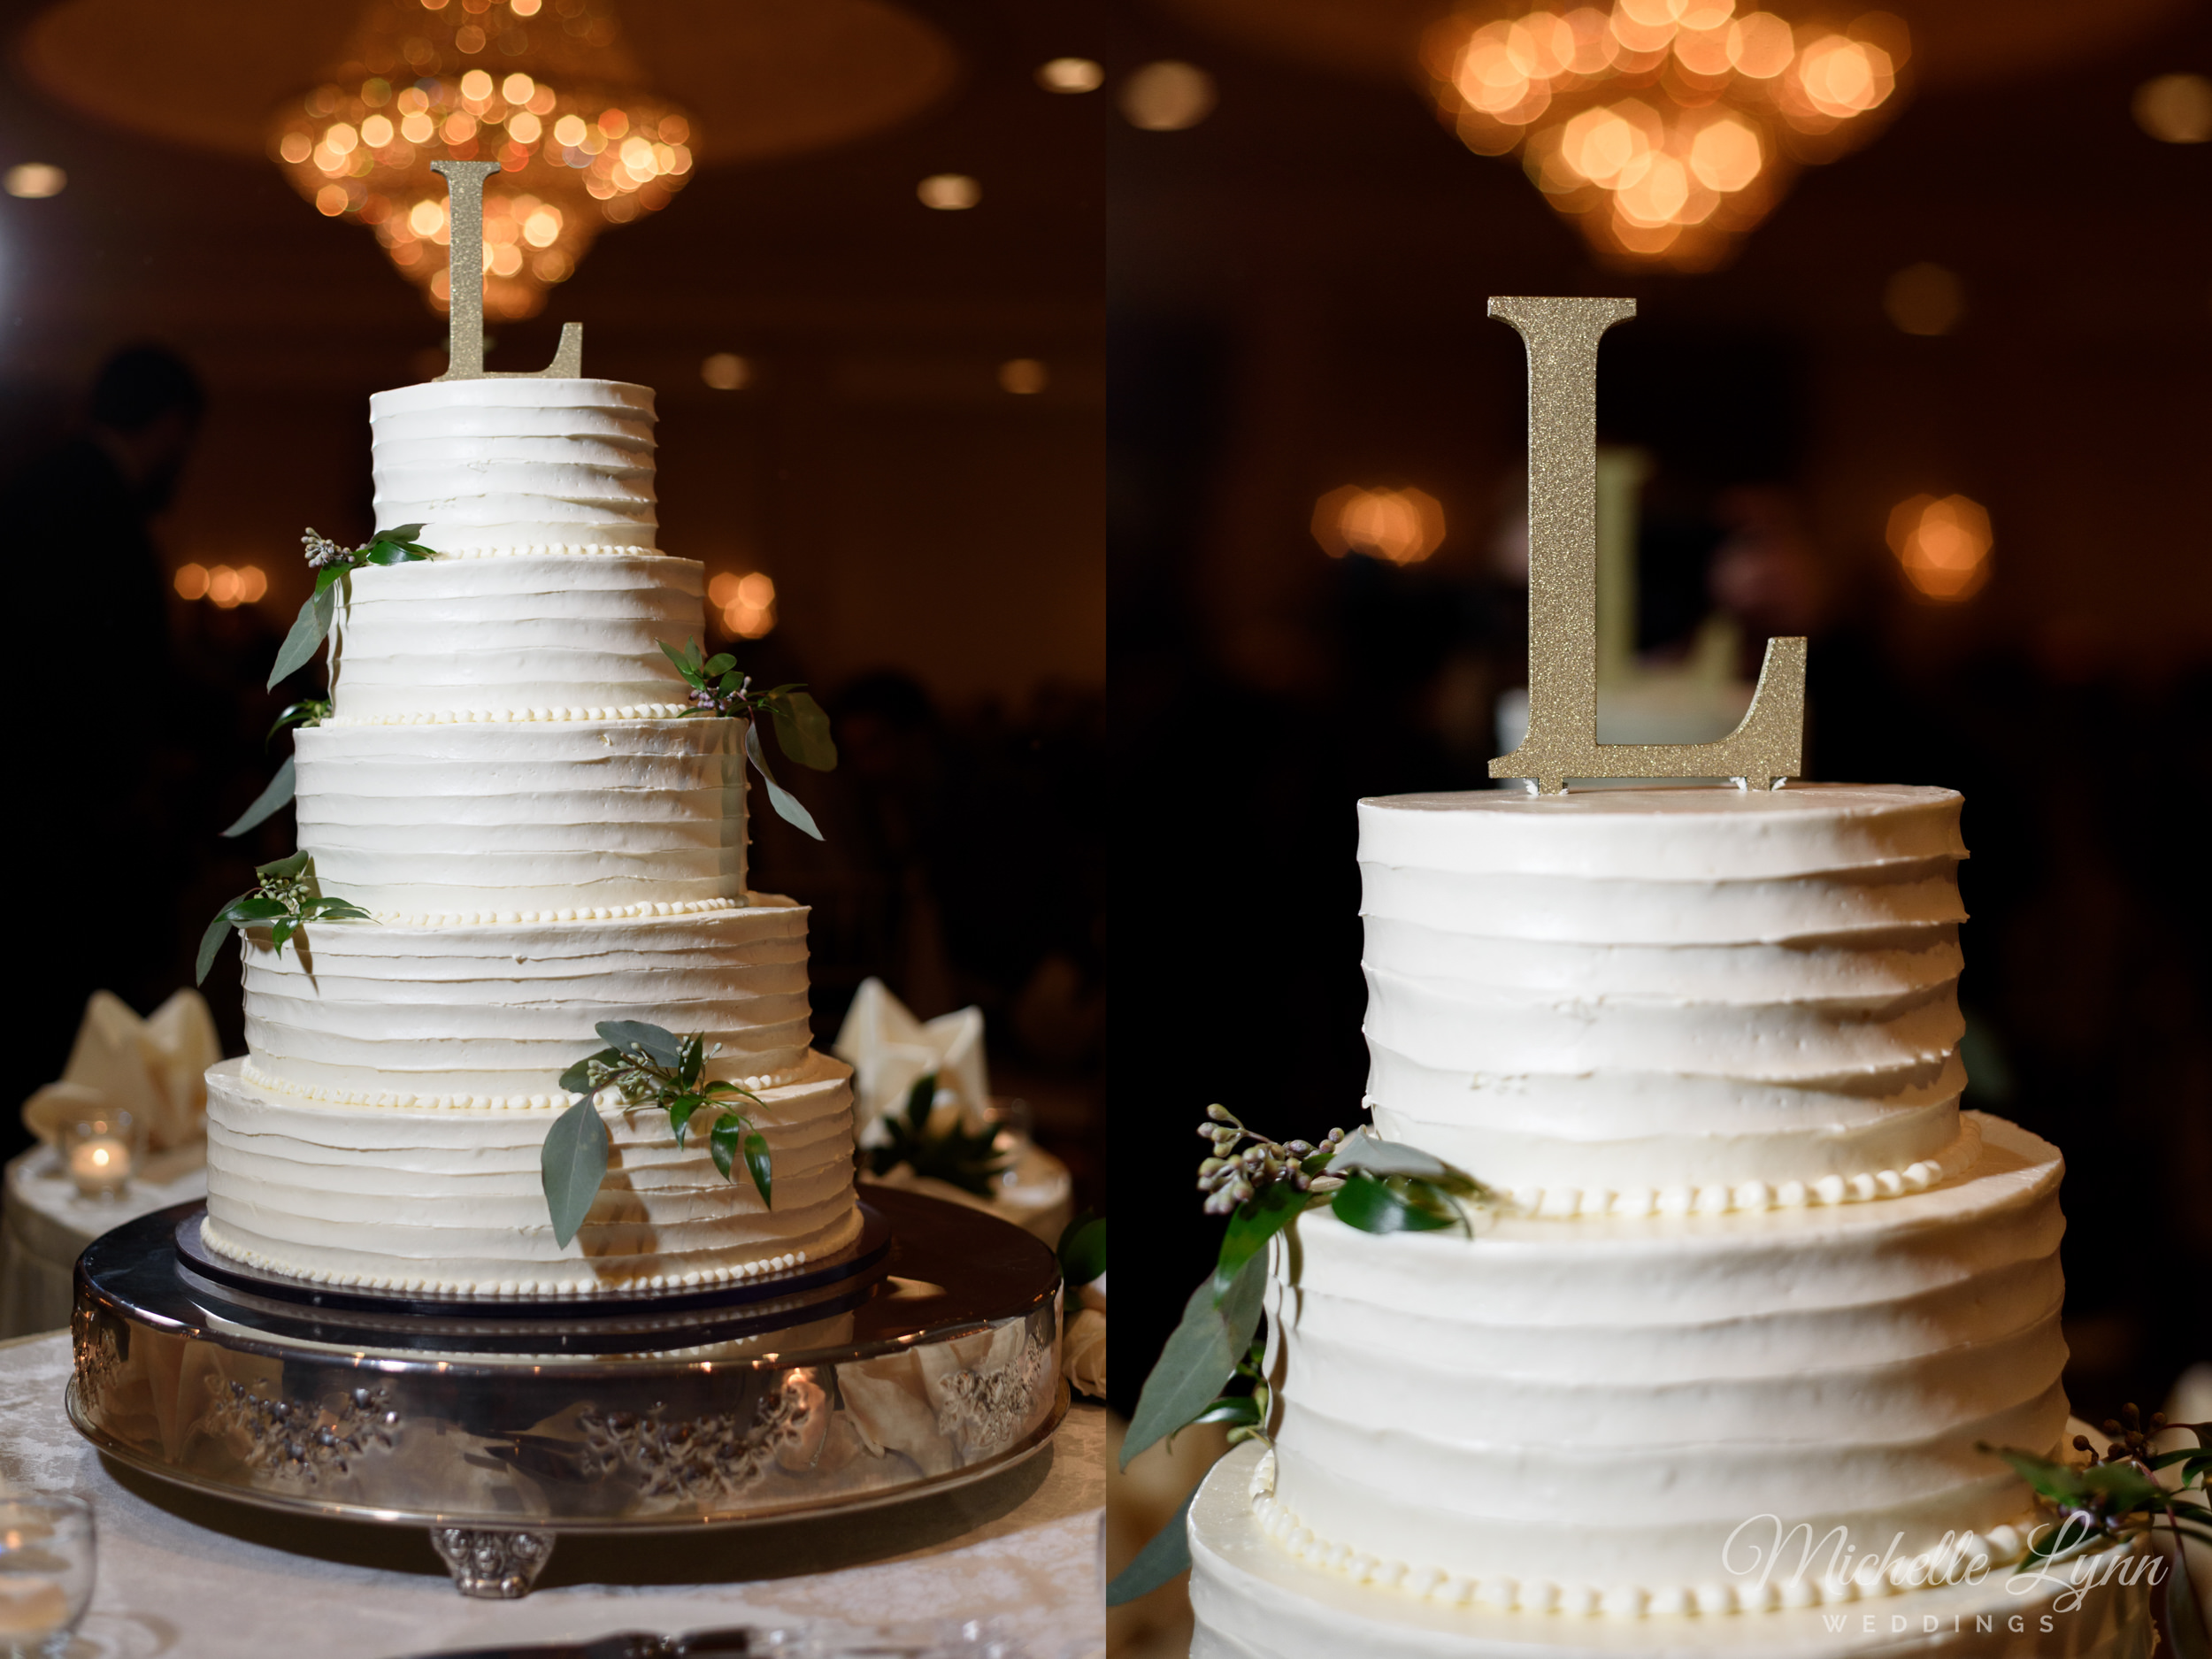 william-penn-inn-wedding-photography-mlw-79.jpg